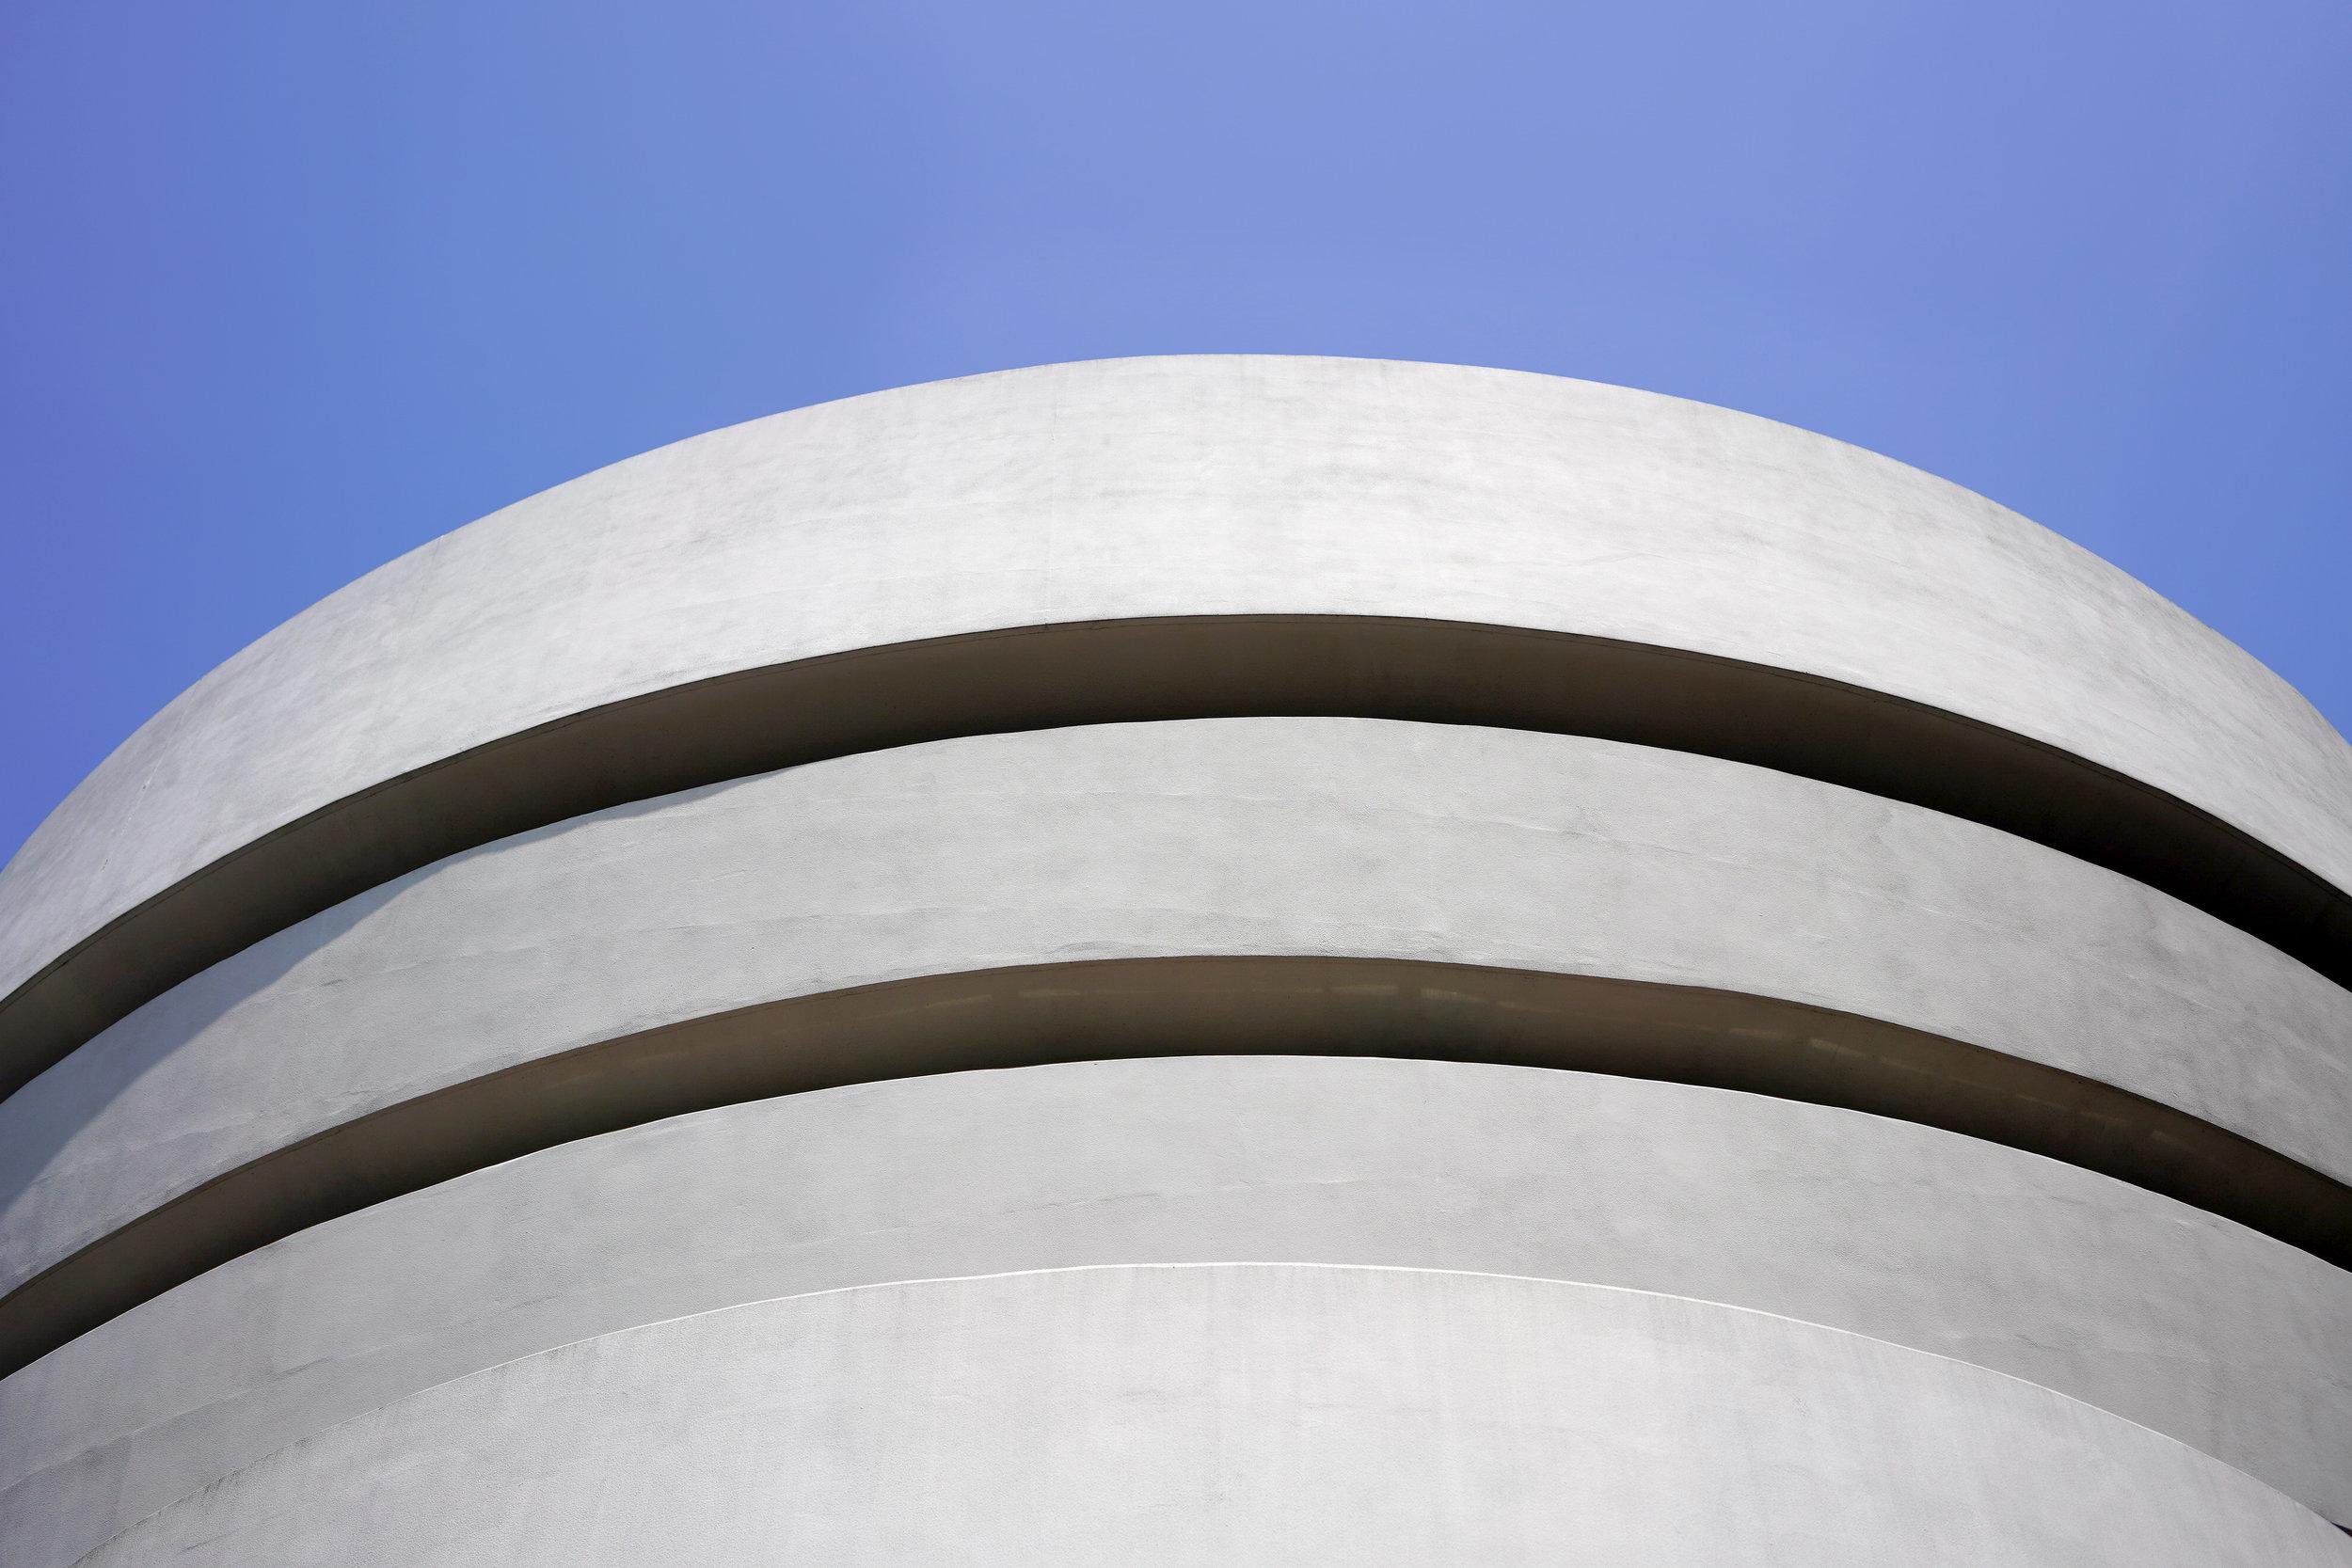 Solomon R. Guggenheim Museum - 1071 5th Ave, New York, NY 10128